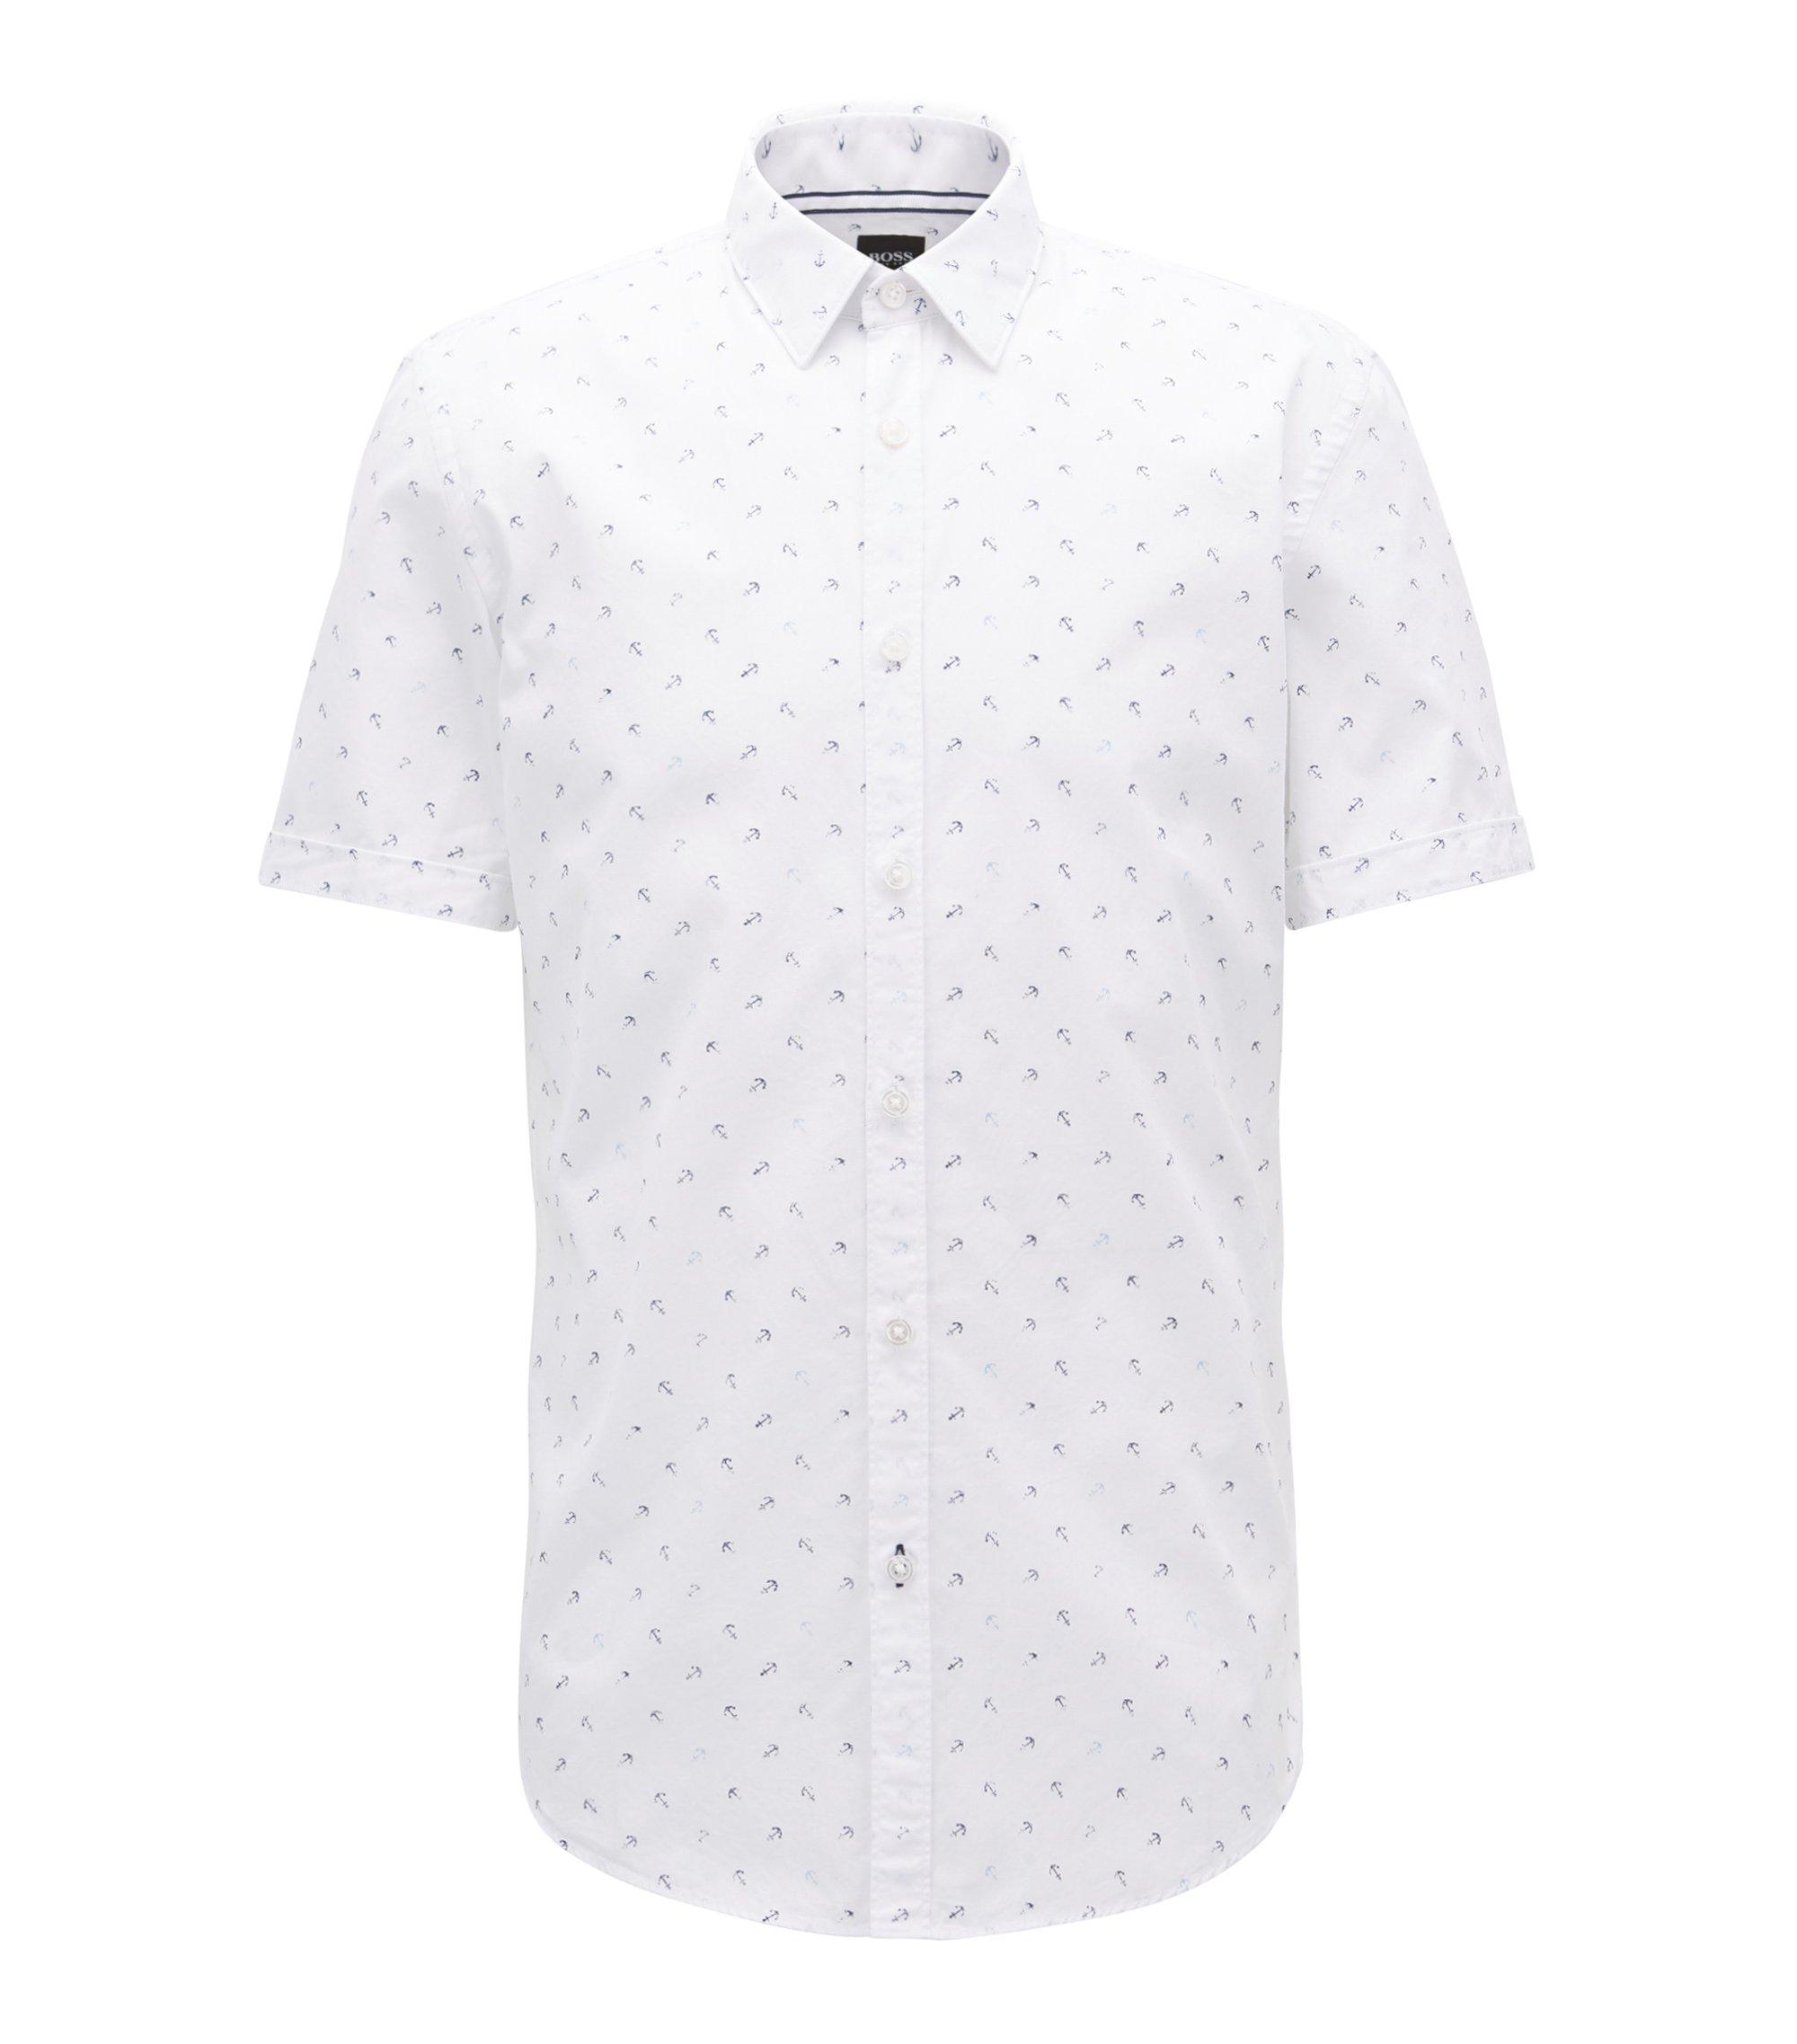 Anchor-Print Sport Shirt, Slim Fit   Ronn, Light Blue